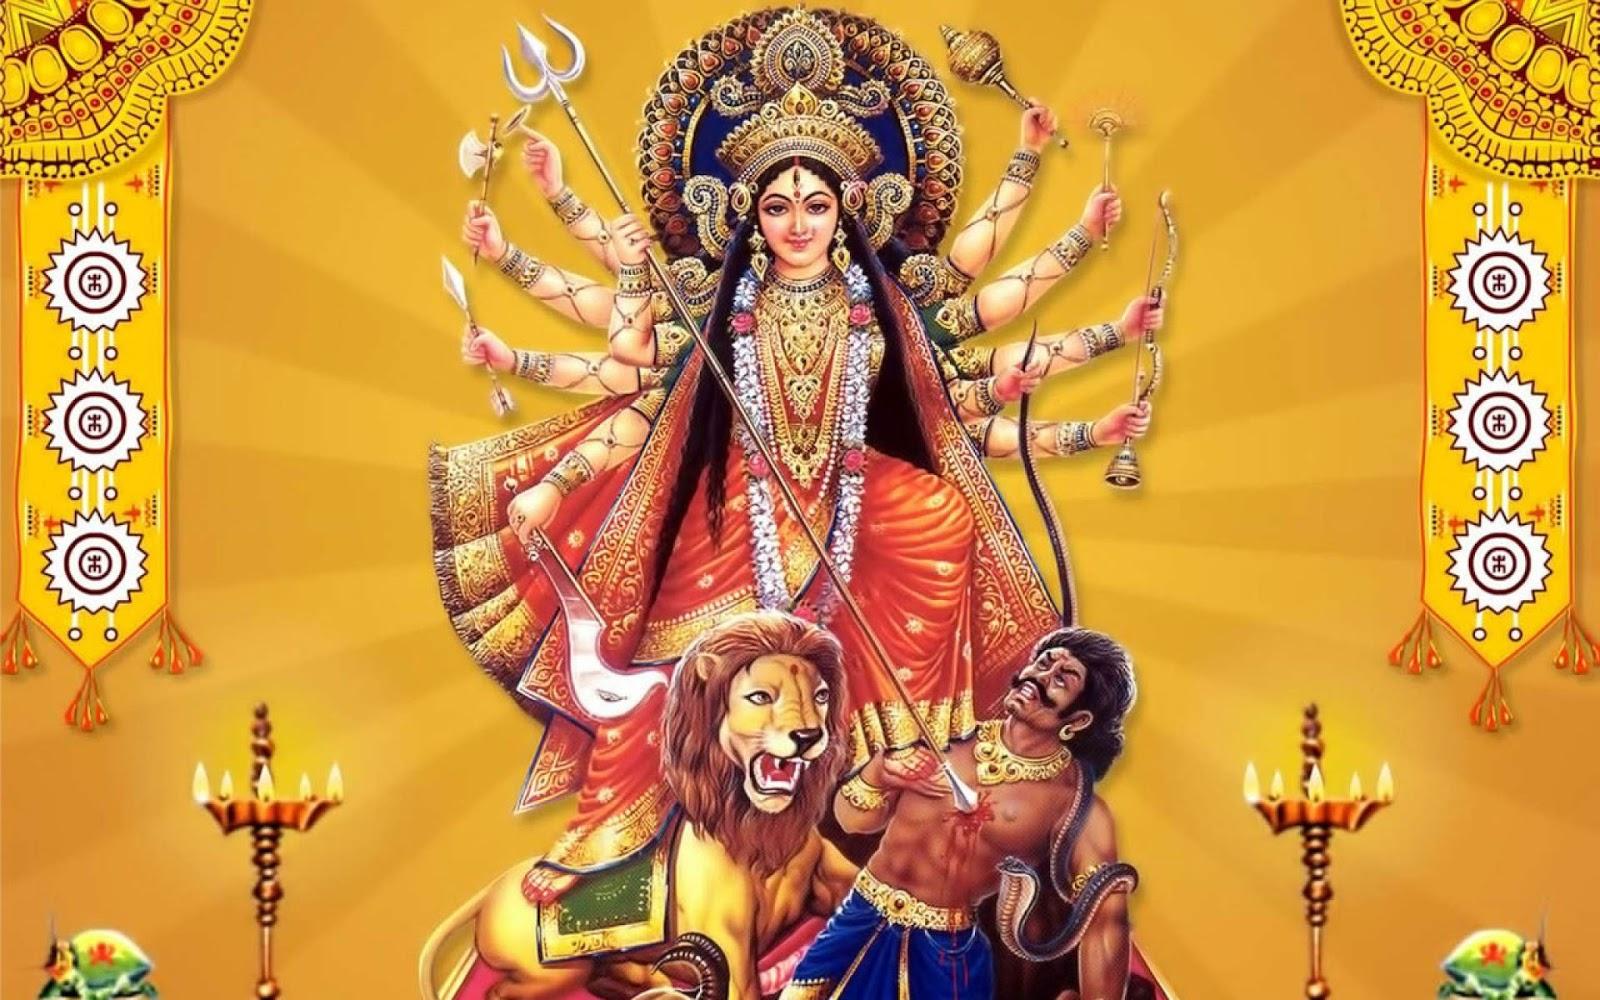 Top Maa Durga God HD Image for free download